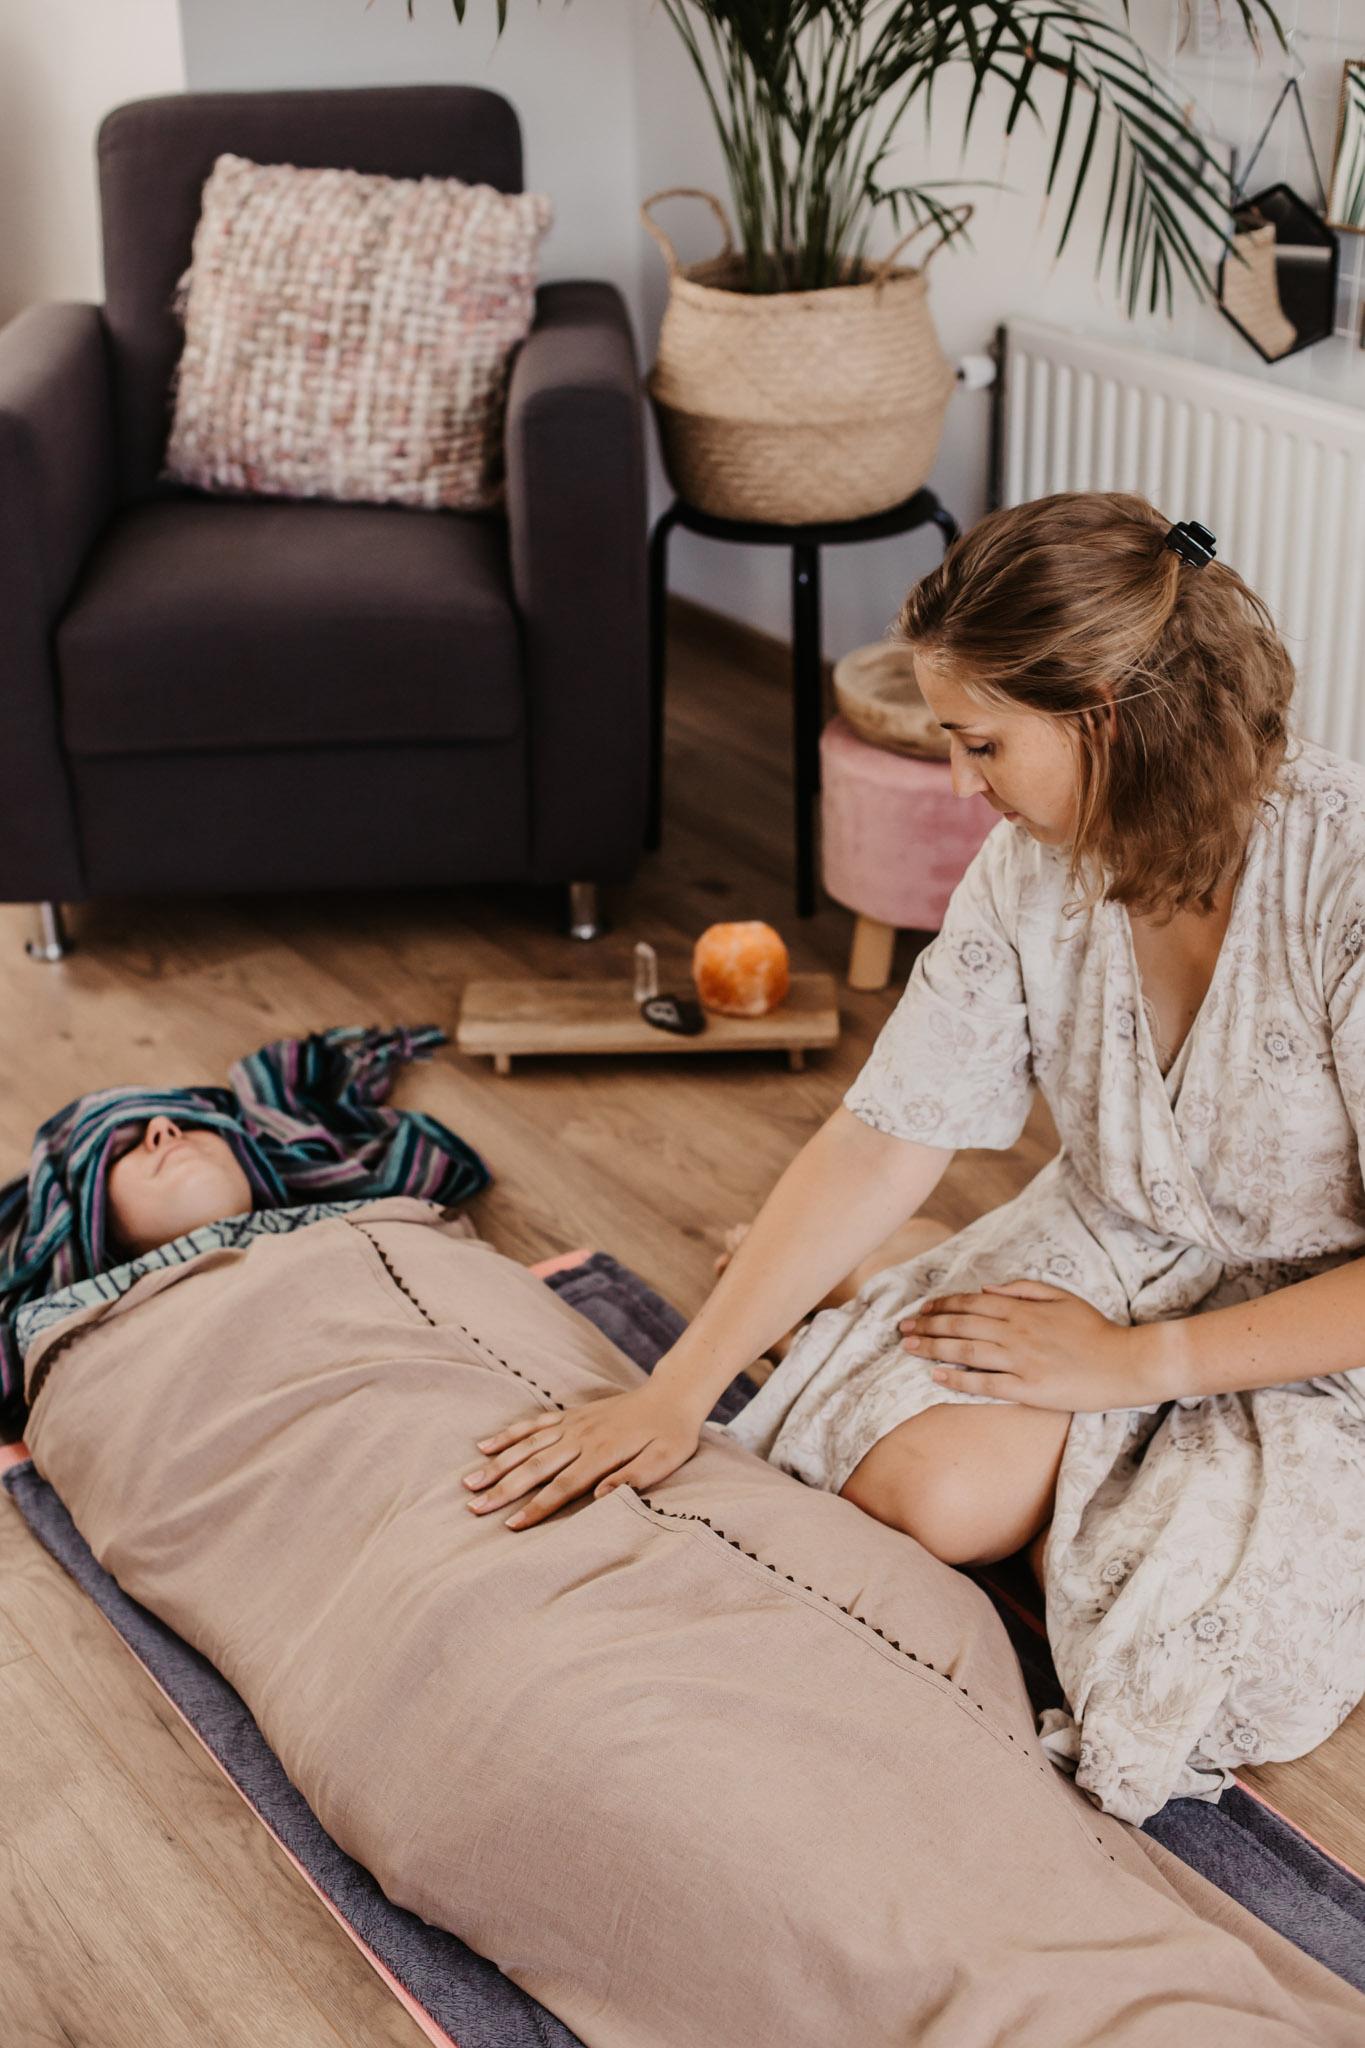 Nicolien-Lettinga-Rebozo-sluitende-massage